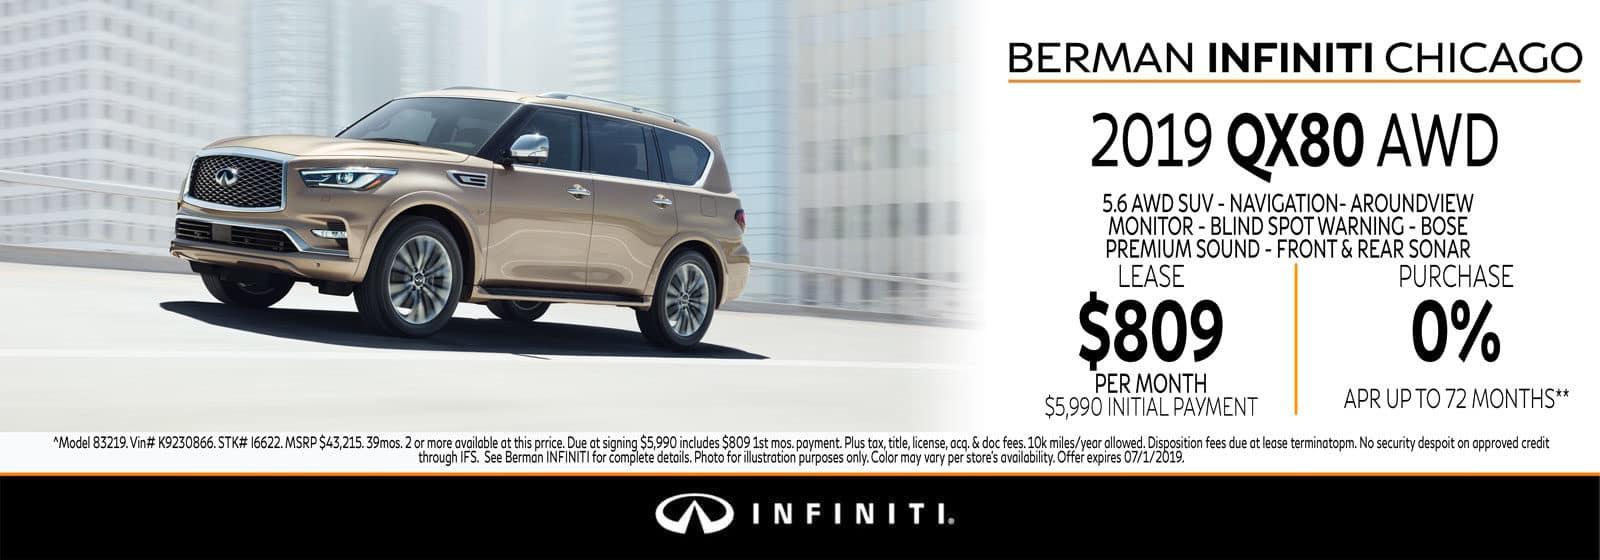 ew 2019 INFINITI QX80 June offer at Berman INFINITI Chicago!